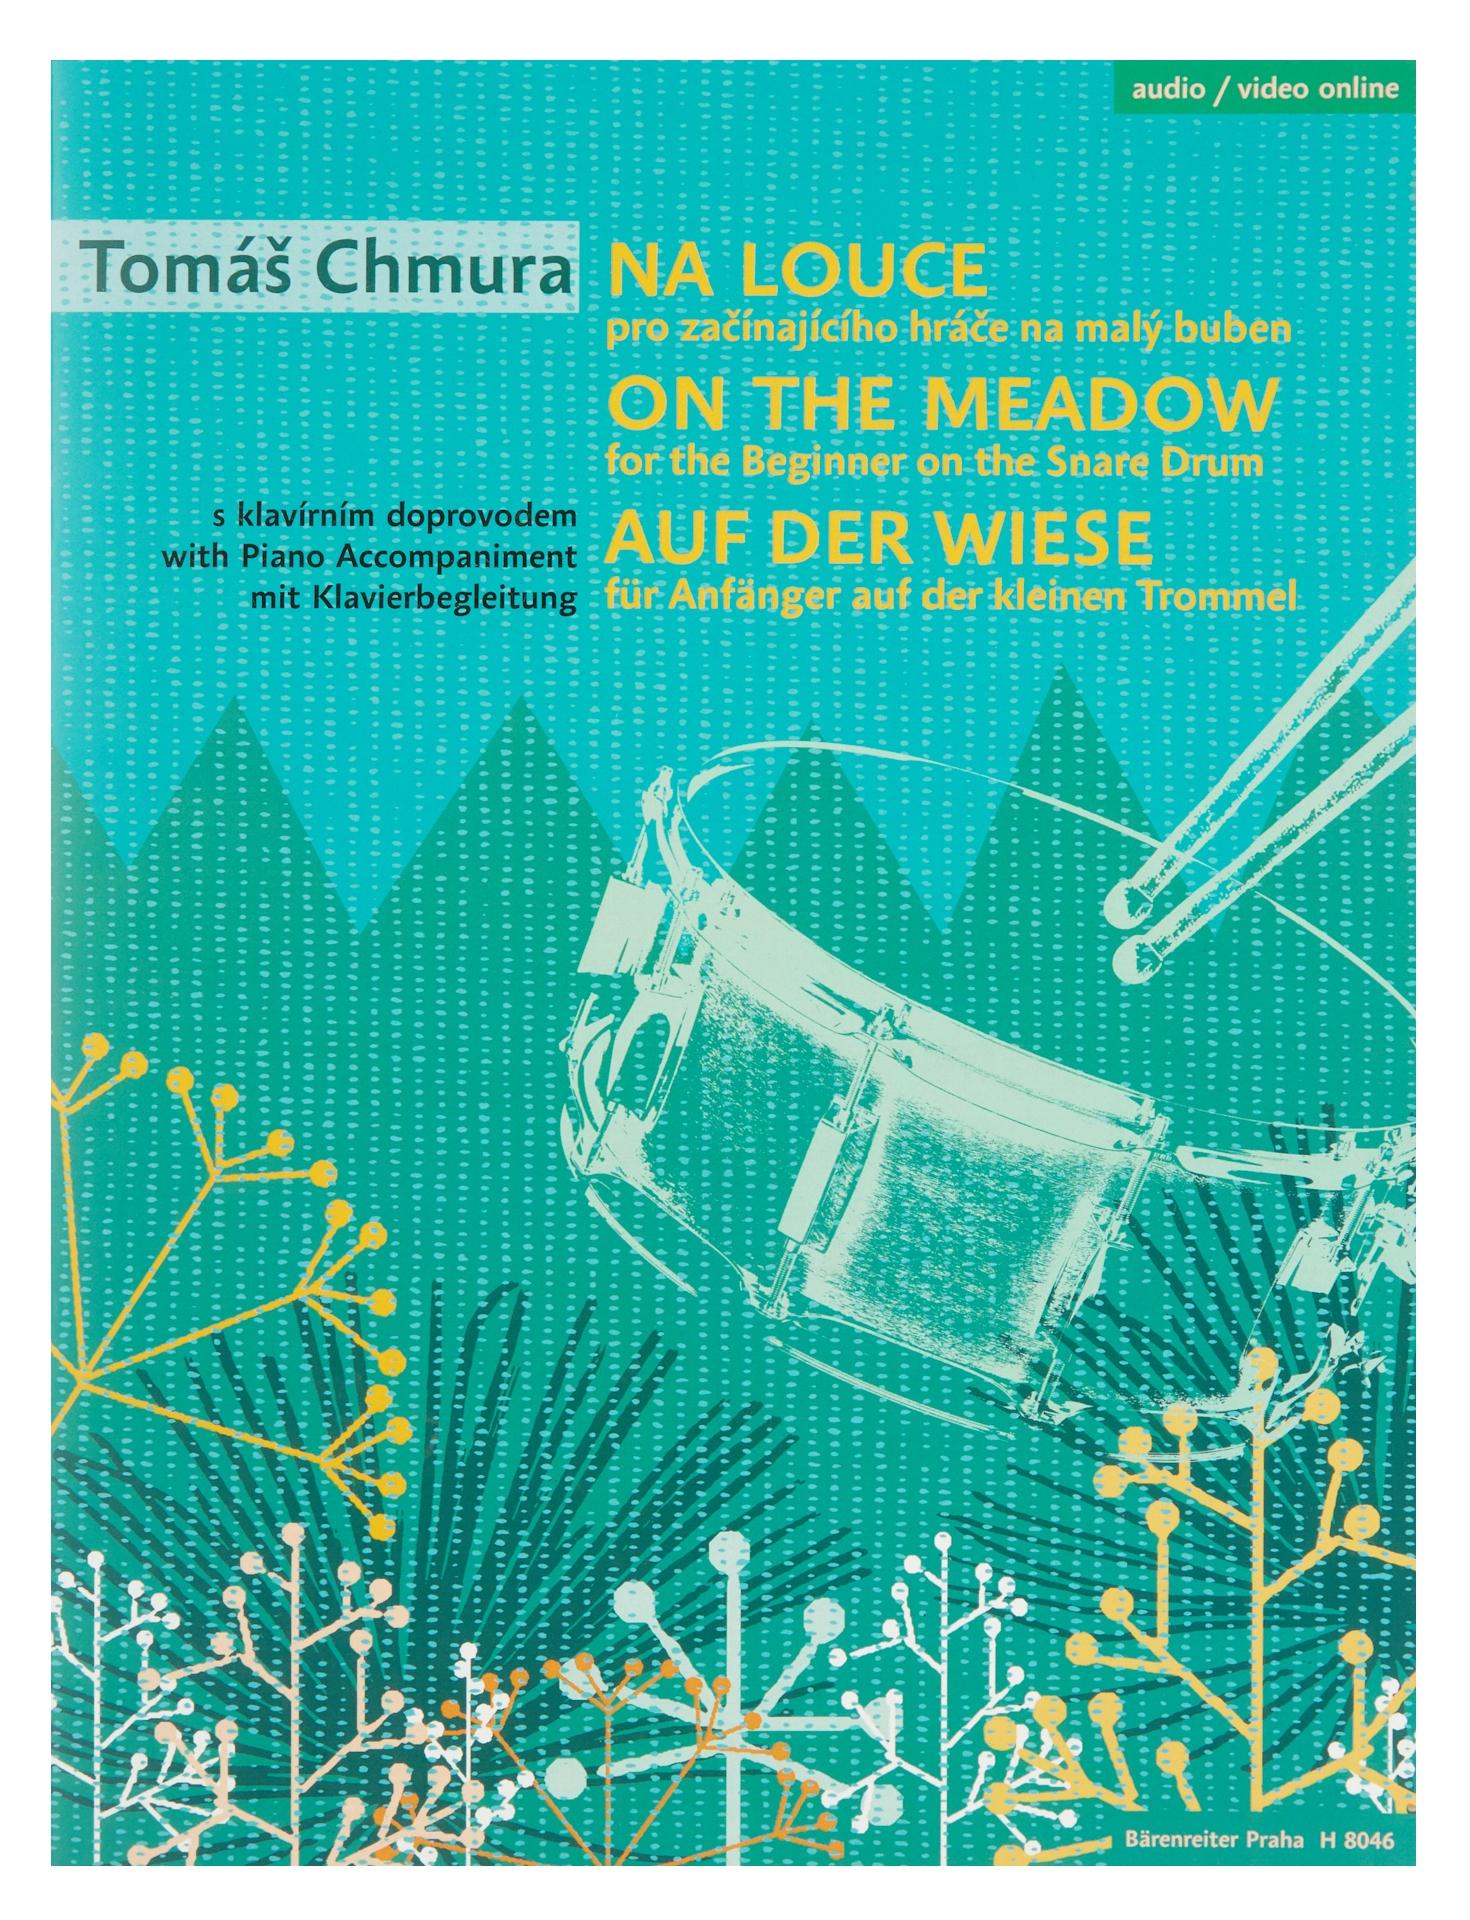 KN Na louce - Tomáš Chmura